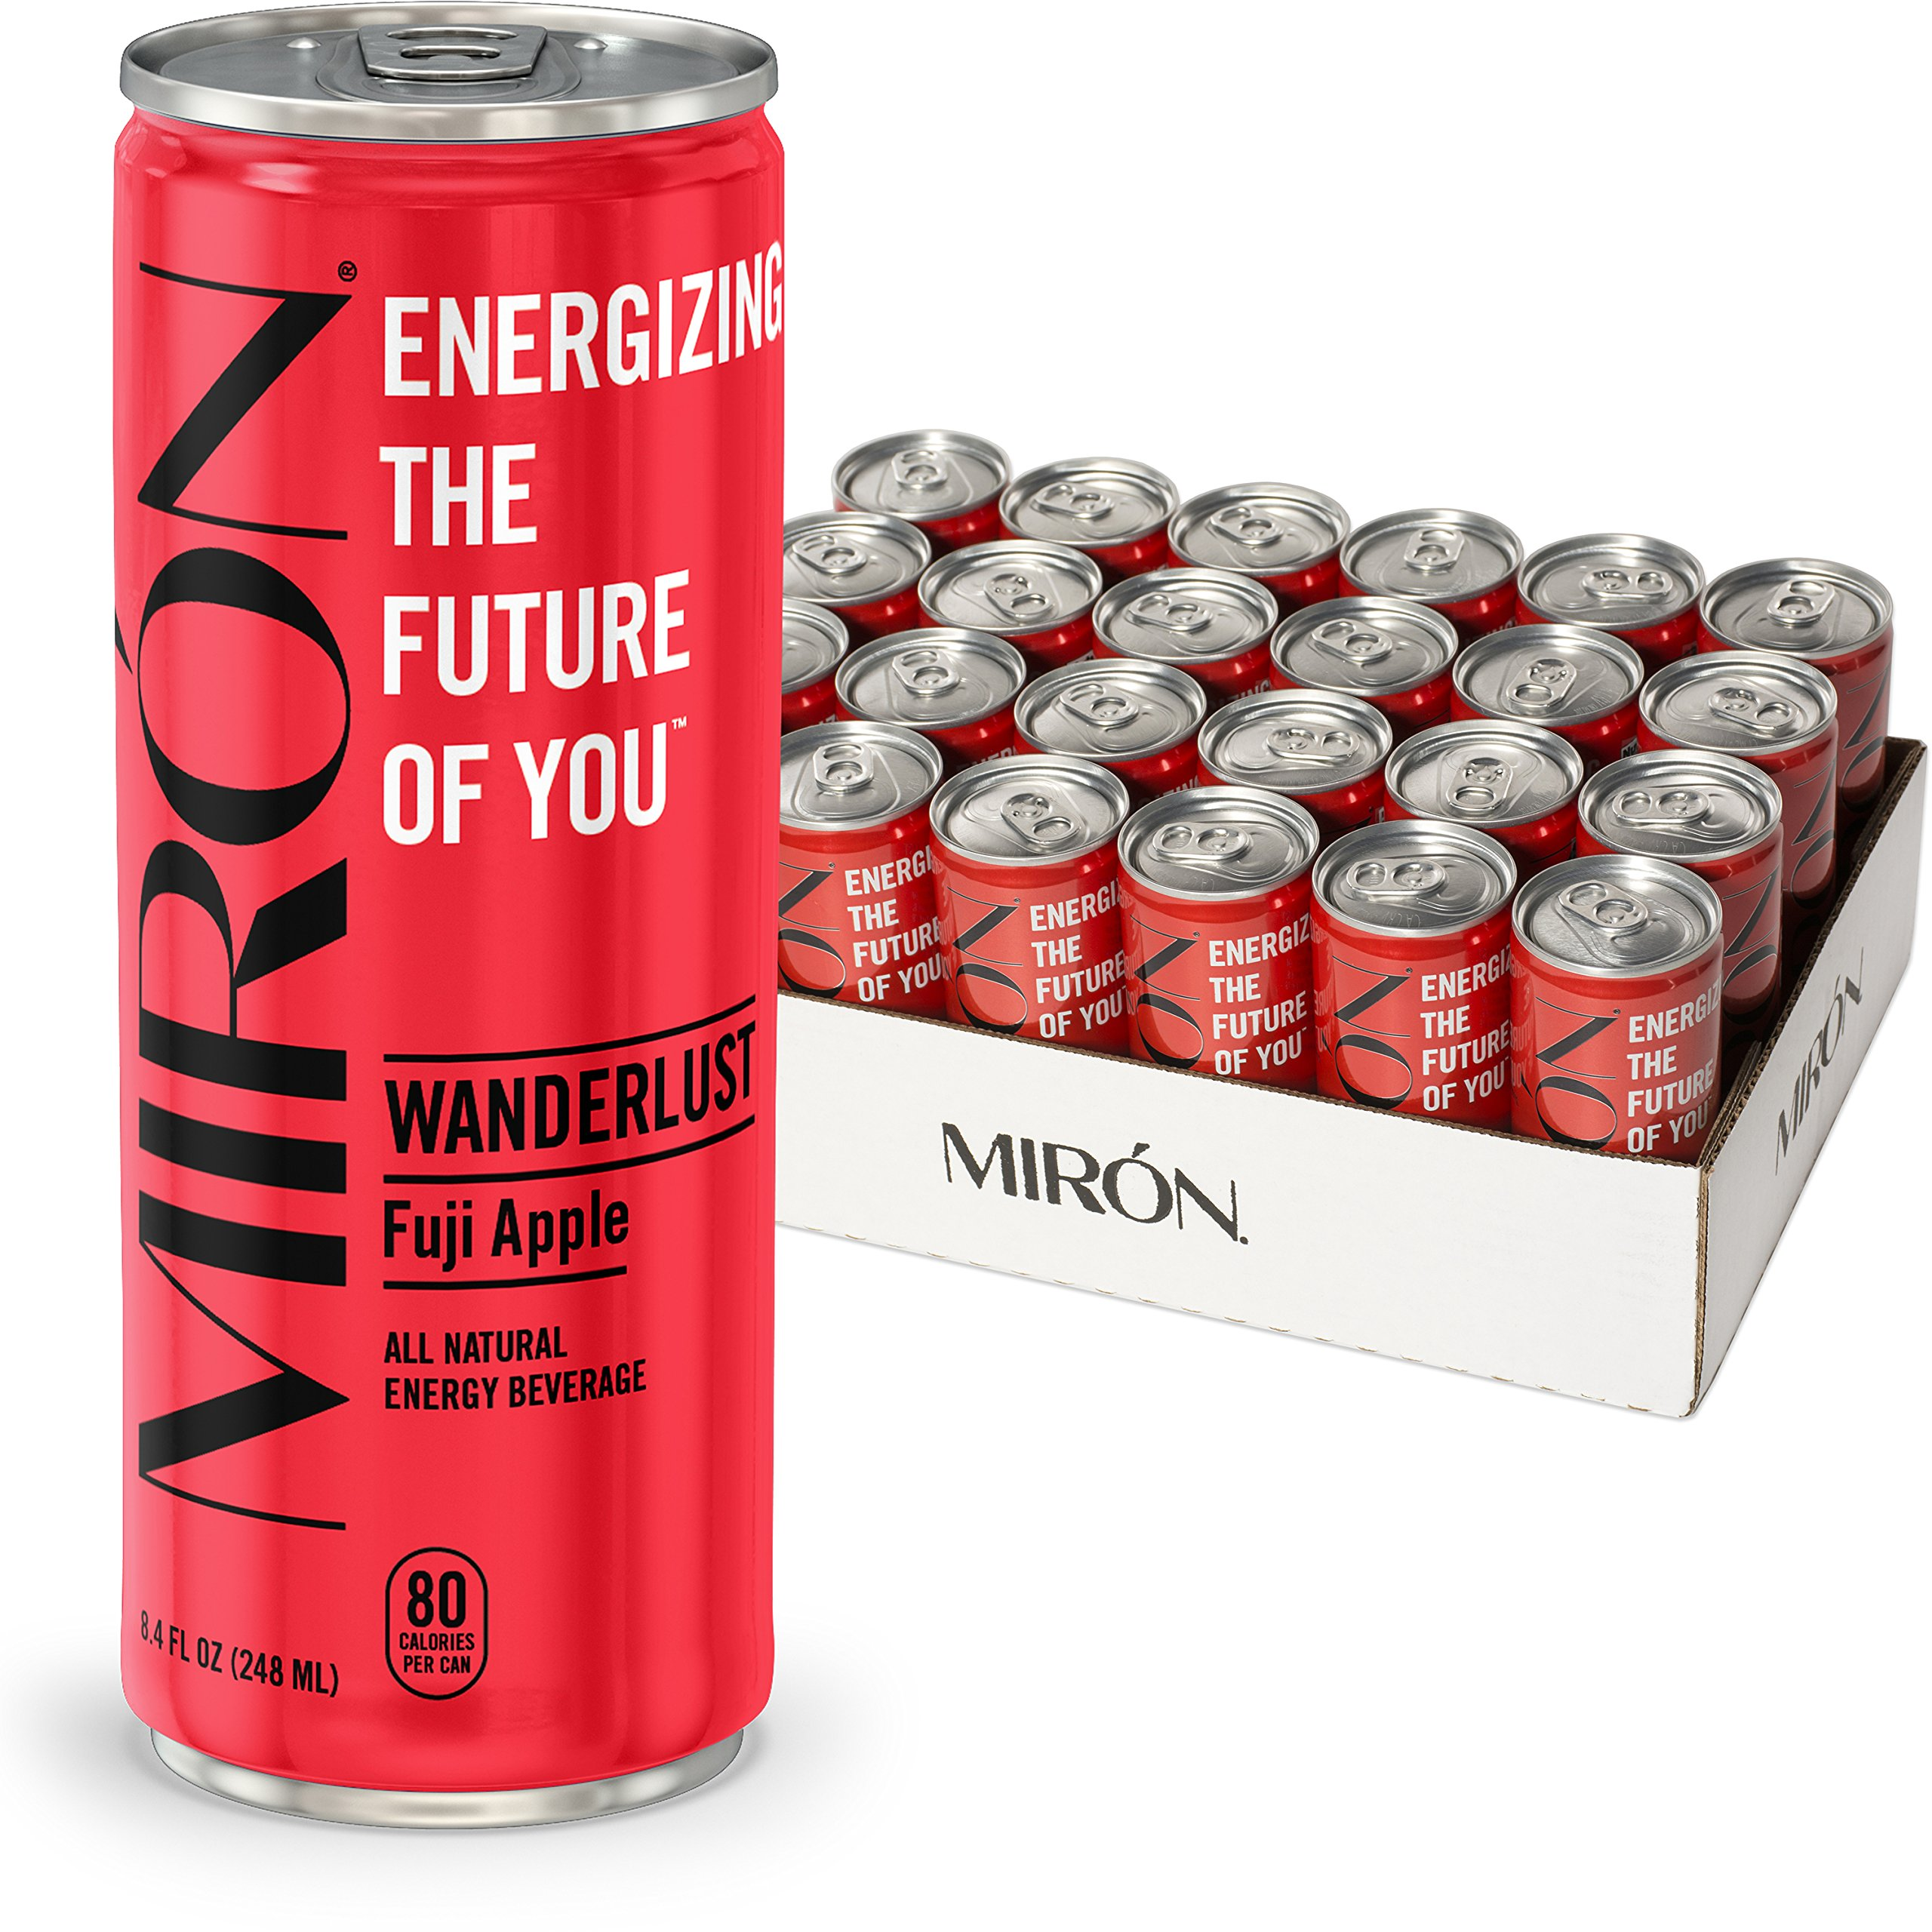 Mirón Fuji Apple All Natural Sparkling Energy Beverage 8.4 Fl.Oz. Cans (Pack of 24)